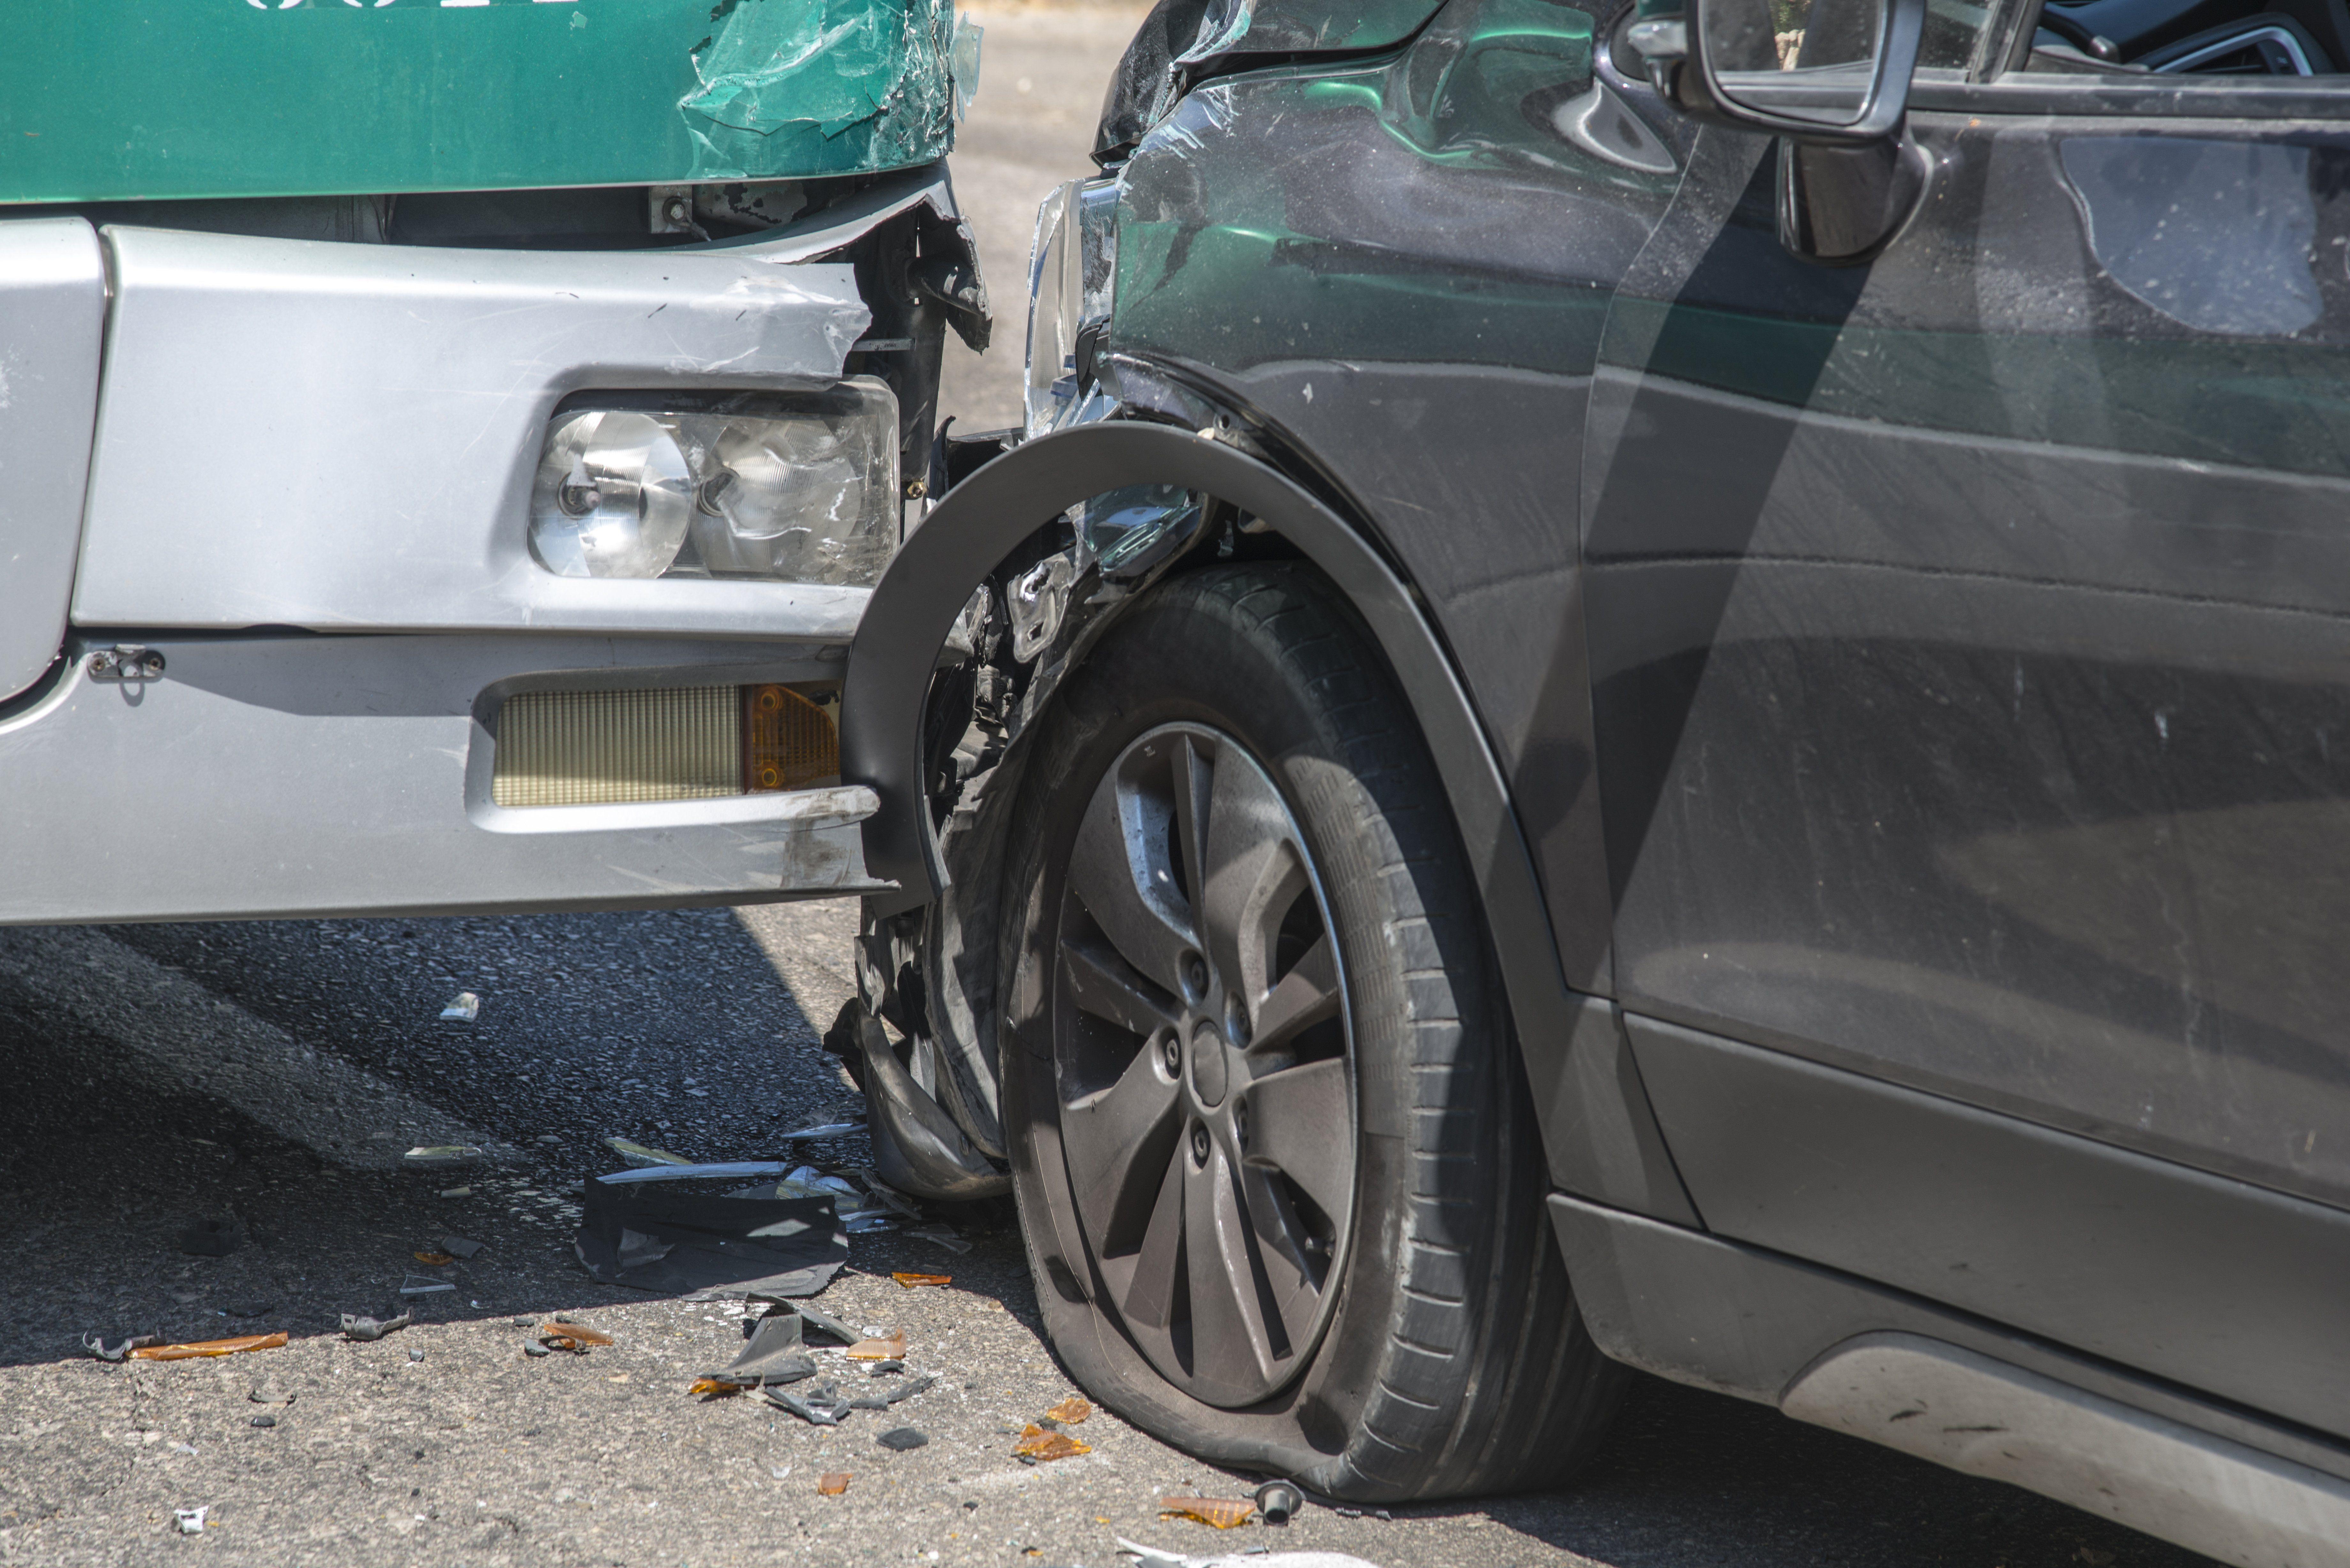 Accidente de tráfico: Servicios de JUAN MARCOS PÉREZ PONT